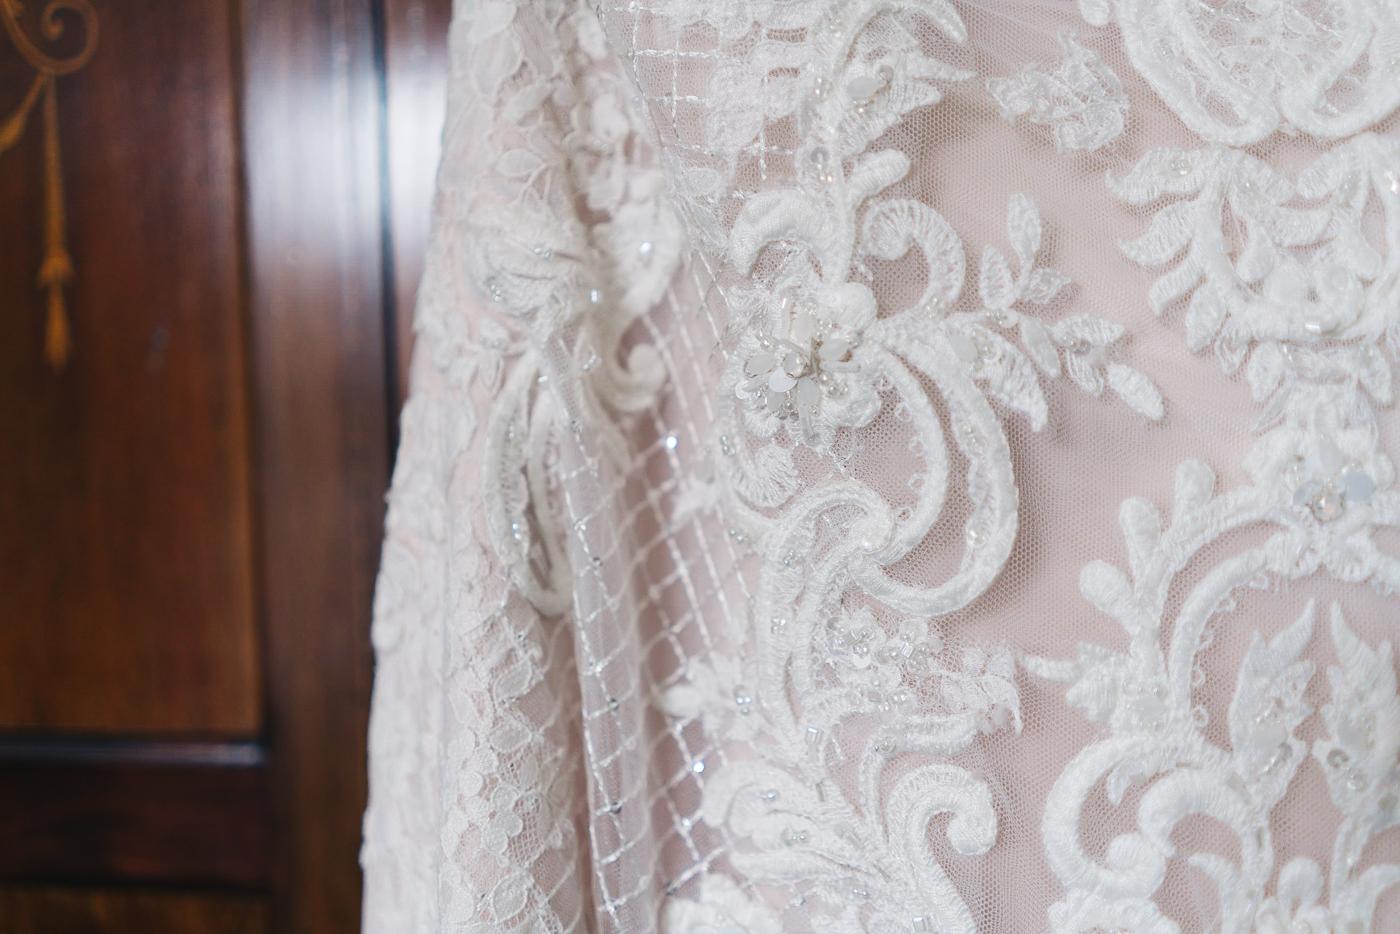 headlame-hall-north-yorkshire-north-east-photographer-wedding-0002.jpg